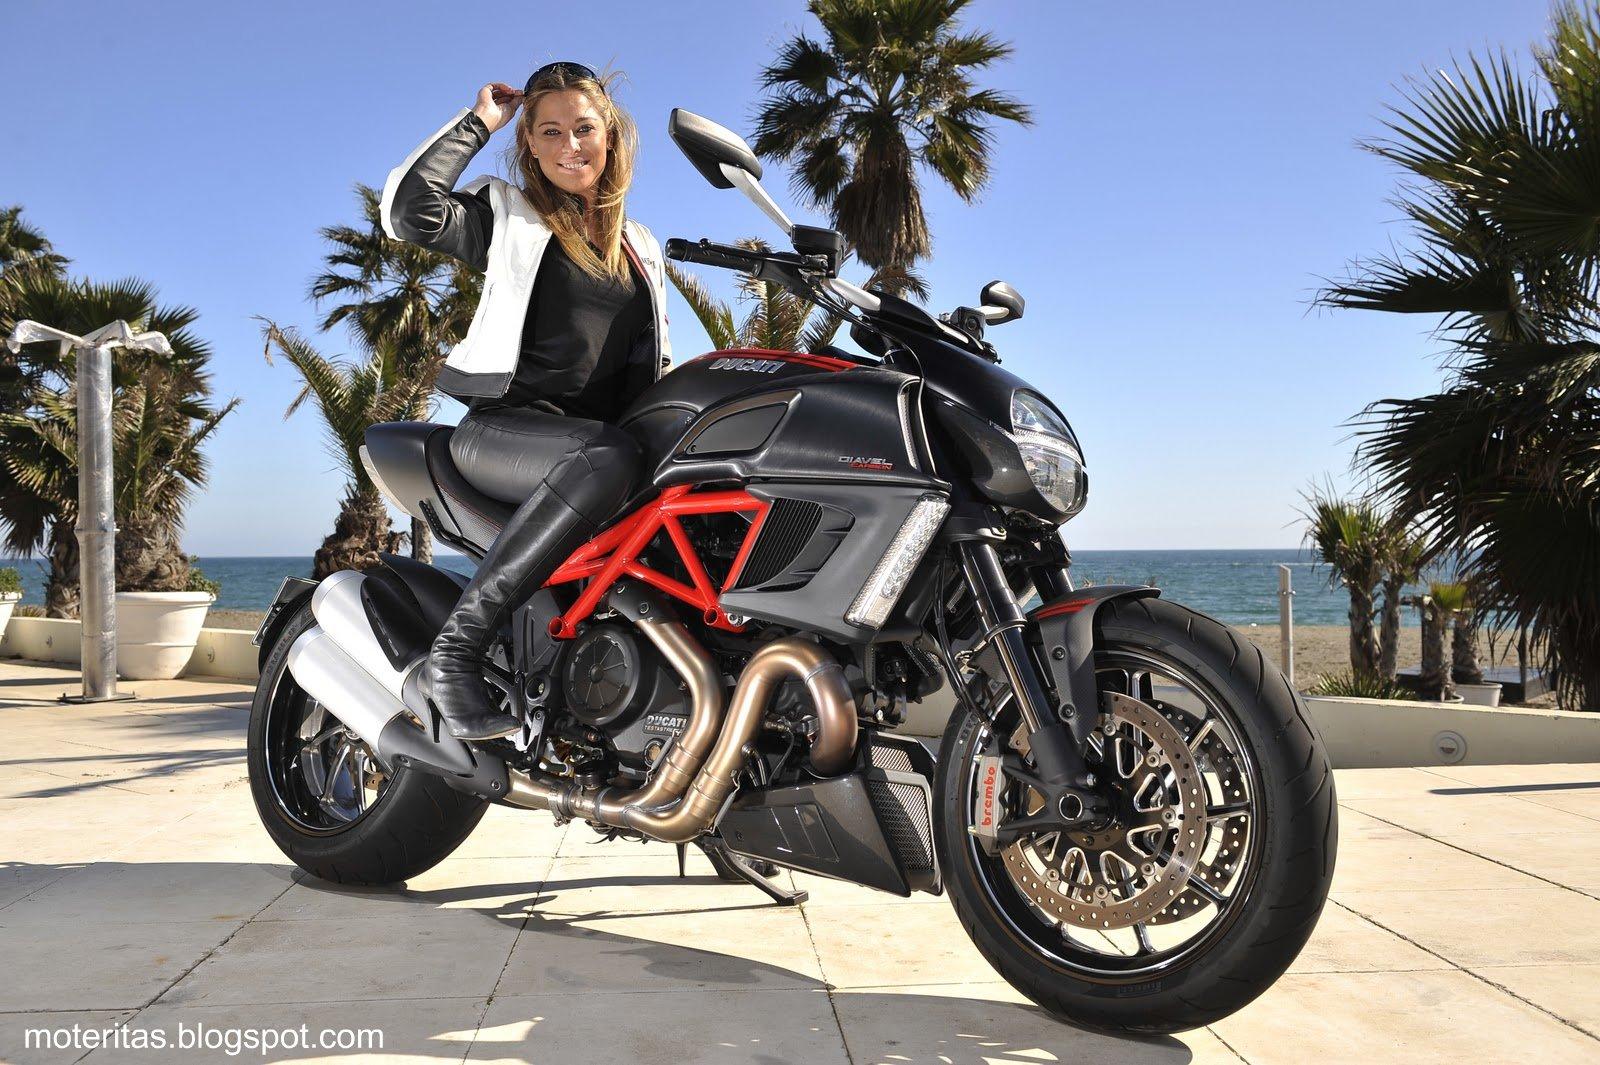 http://3.bp.blogspot.com/-iRZRQNIX4ZA/TnIB0HXS79I/AAAAAAAAAVk/4h1oaqV8YAc/s1600/Ducati-Diavel-motos-chicas-wallpaper%2B786%2B%255Bmoteritas.blogspot.com%255D.jpeg